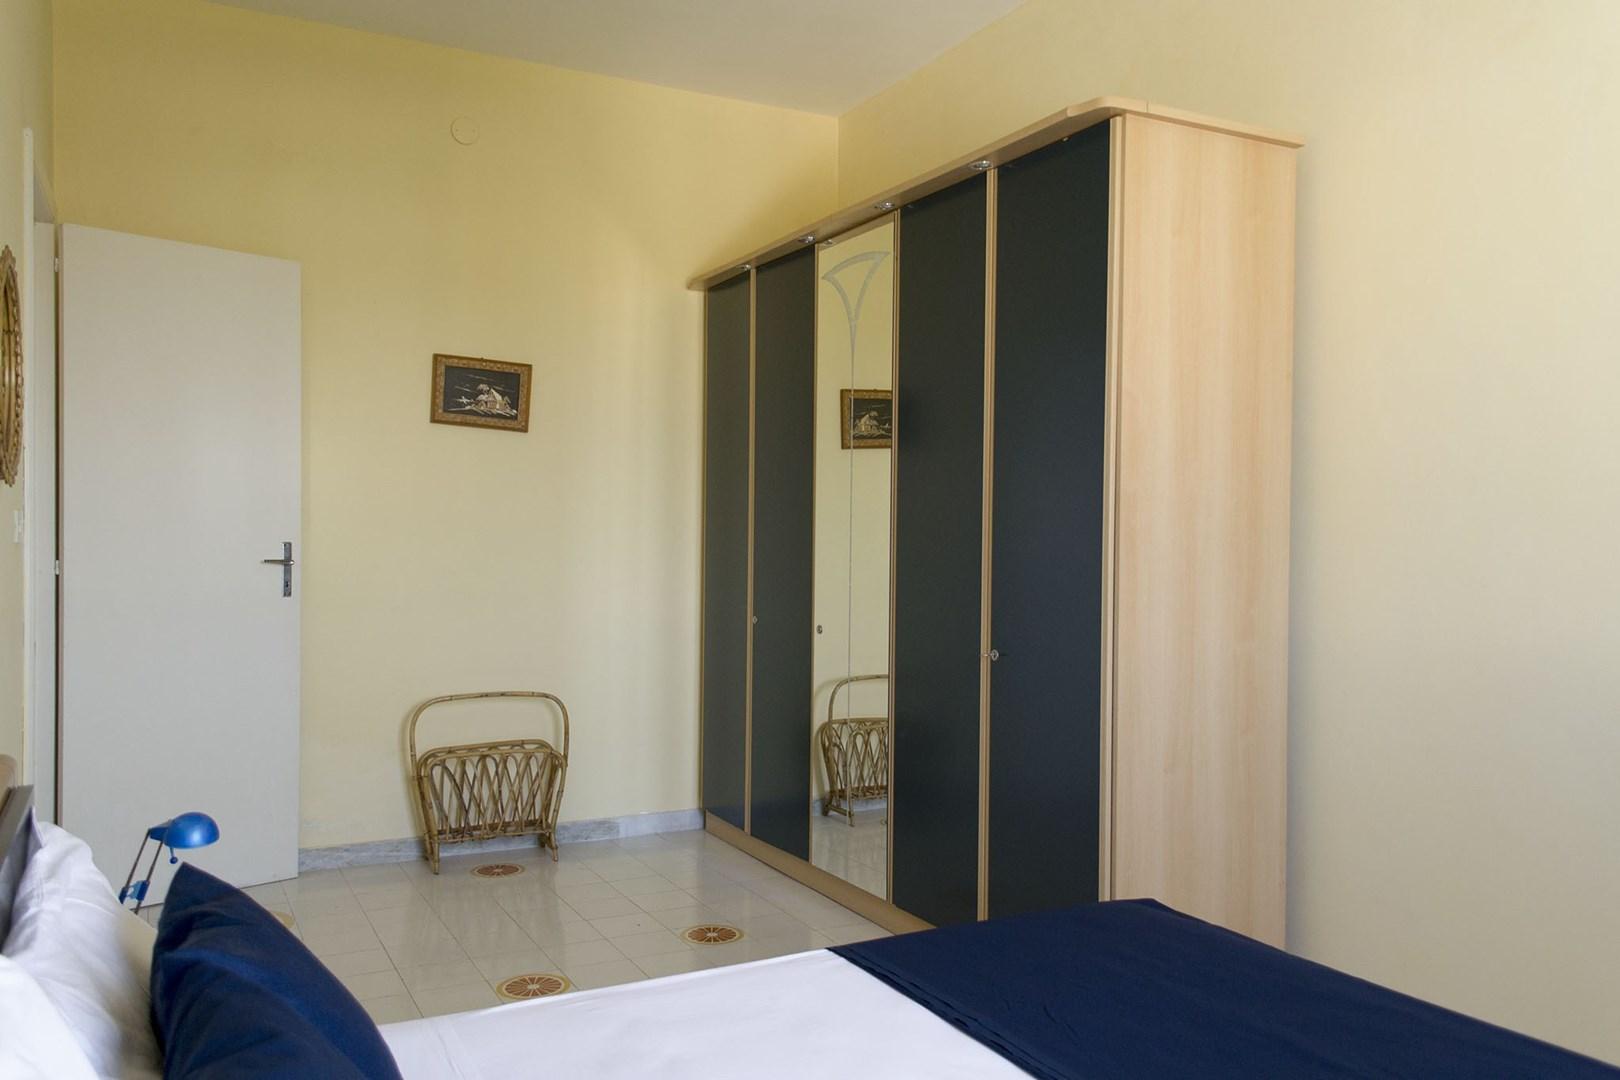 508_appartamento-lenin_camera_matrimoniale_2.jpg